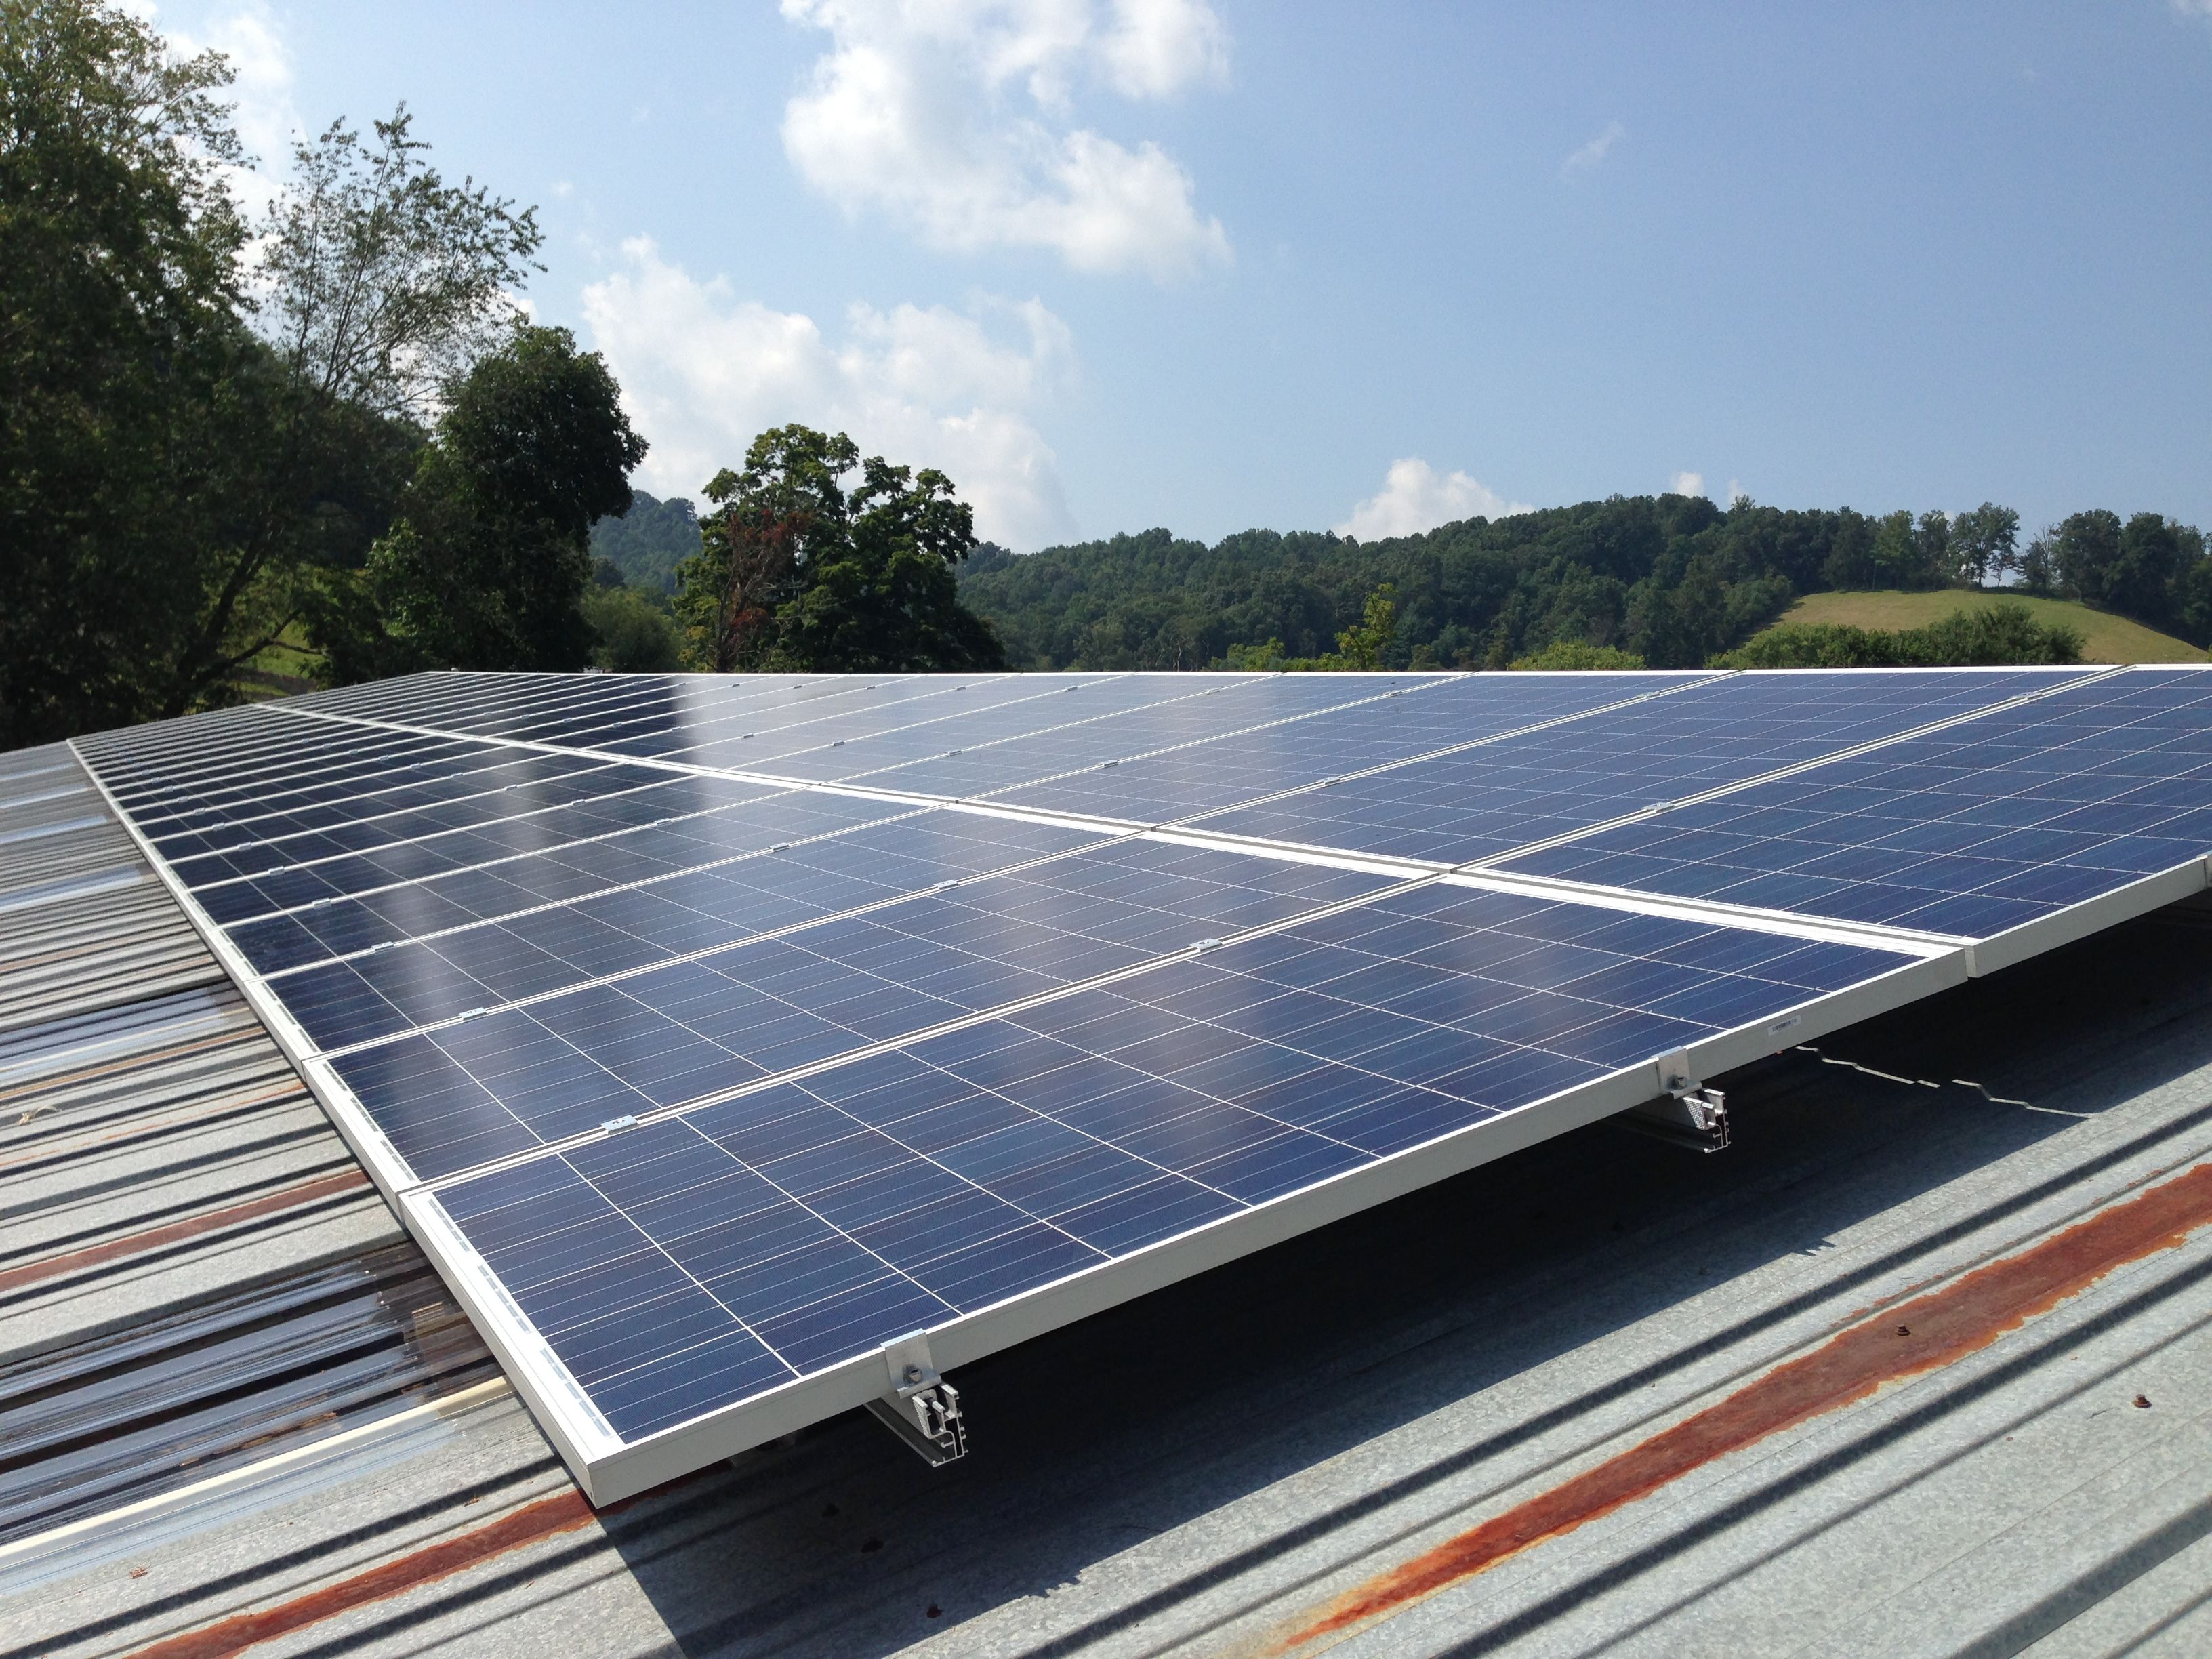 grid tied solar array on a barn roof solar electric photovoltaic